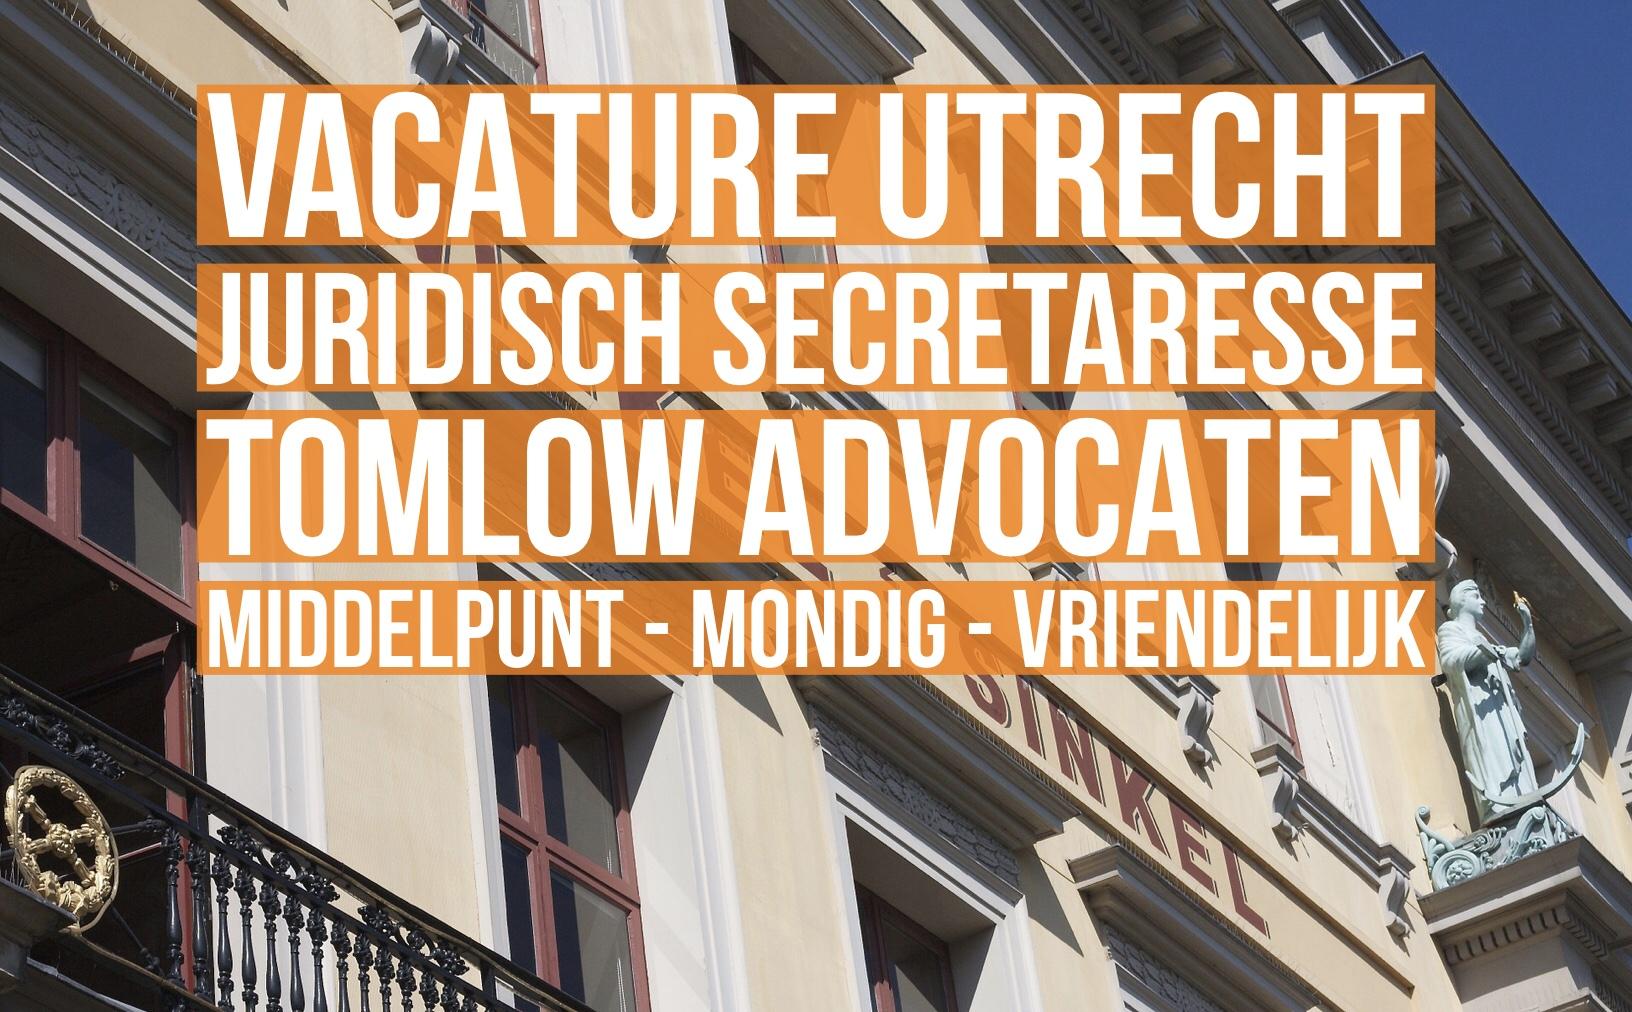 Juridisch Secretaresse Utrecht Vacature Tomlow Advocaten